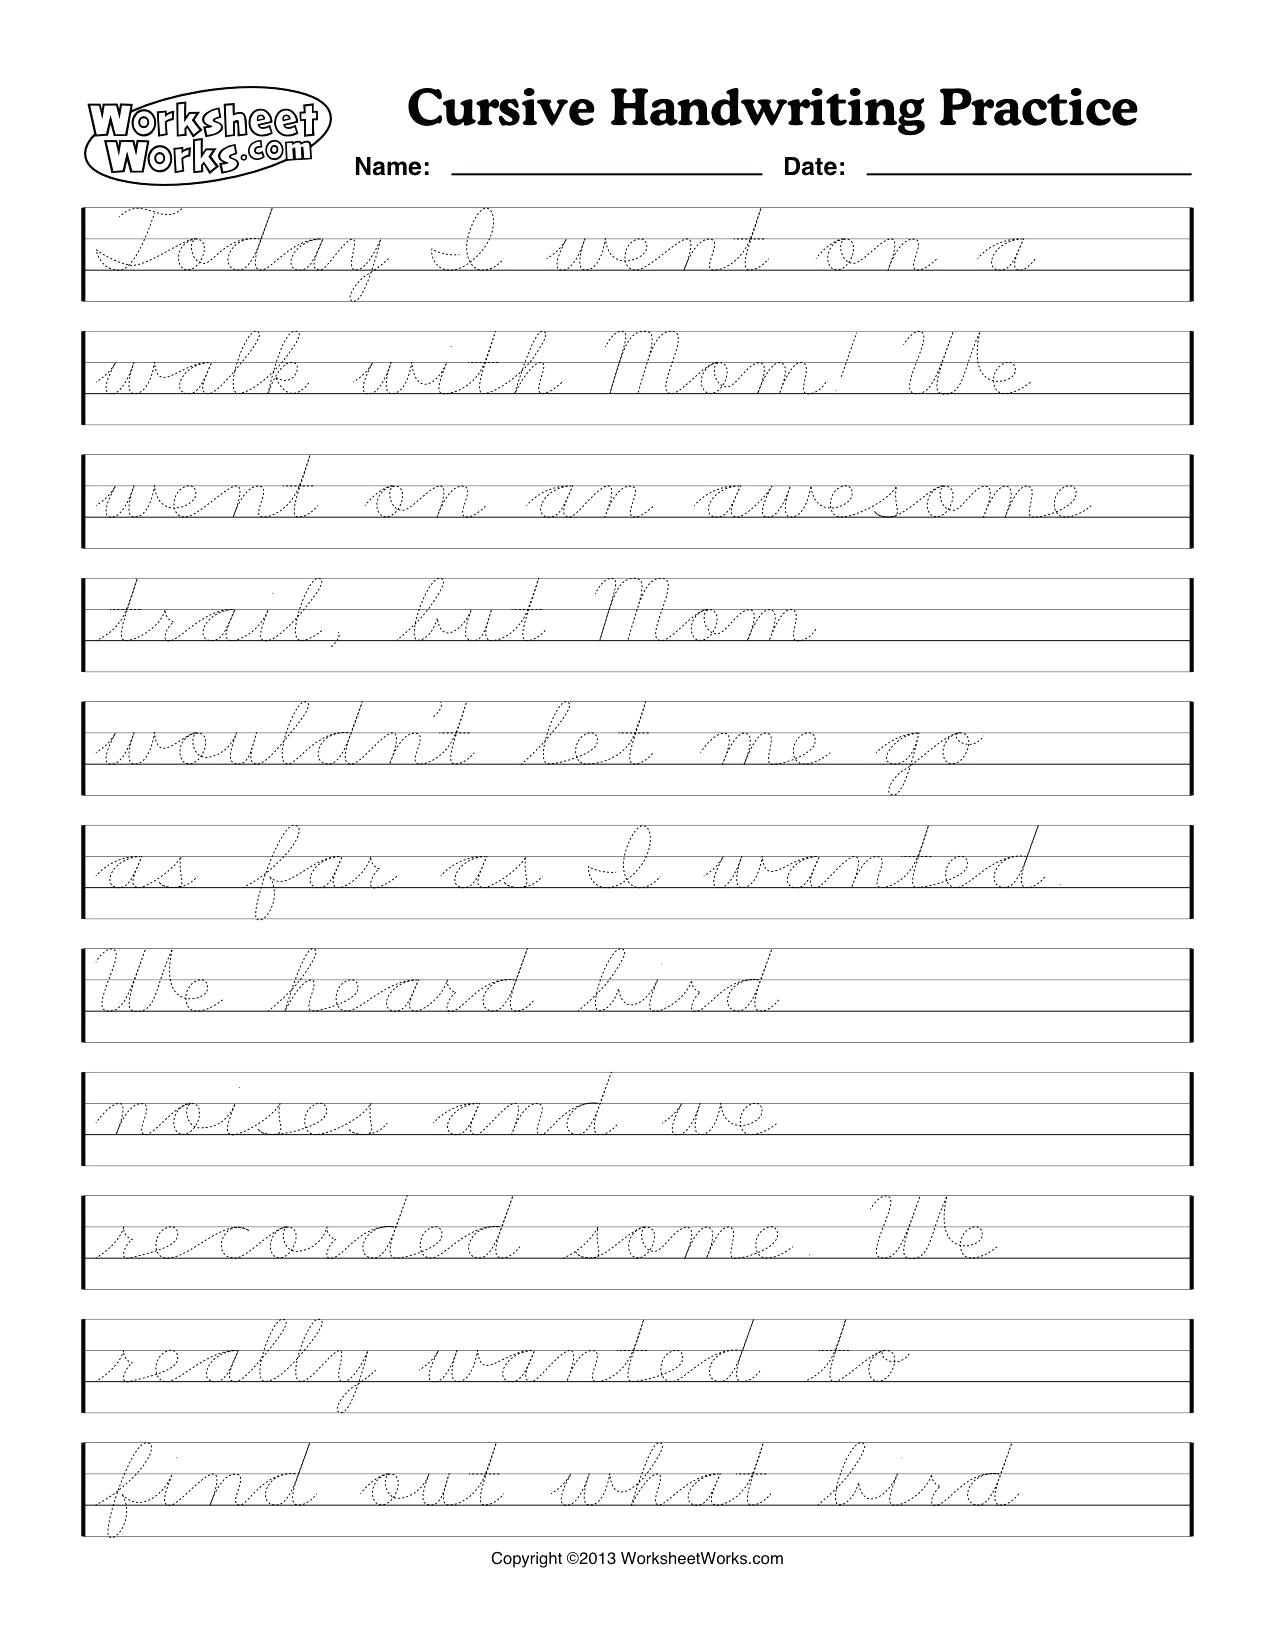 Printable Cursive Name Sheets Cursive Name Worksheets Cursive - Free Printable Cursive Handwriting Worksheets